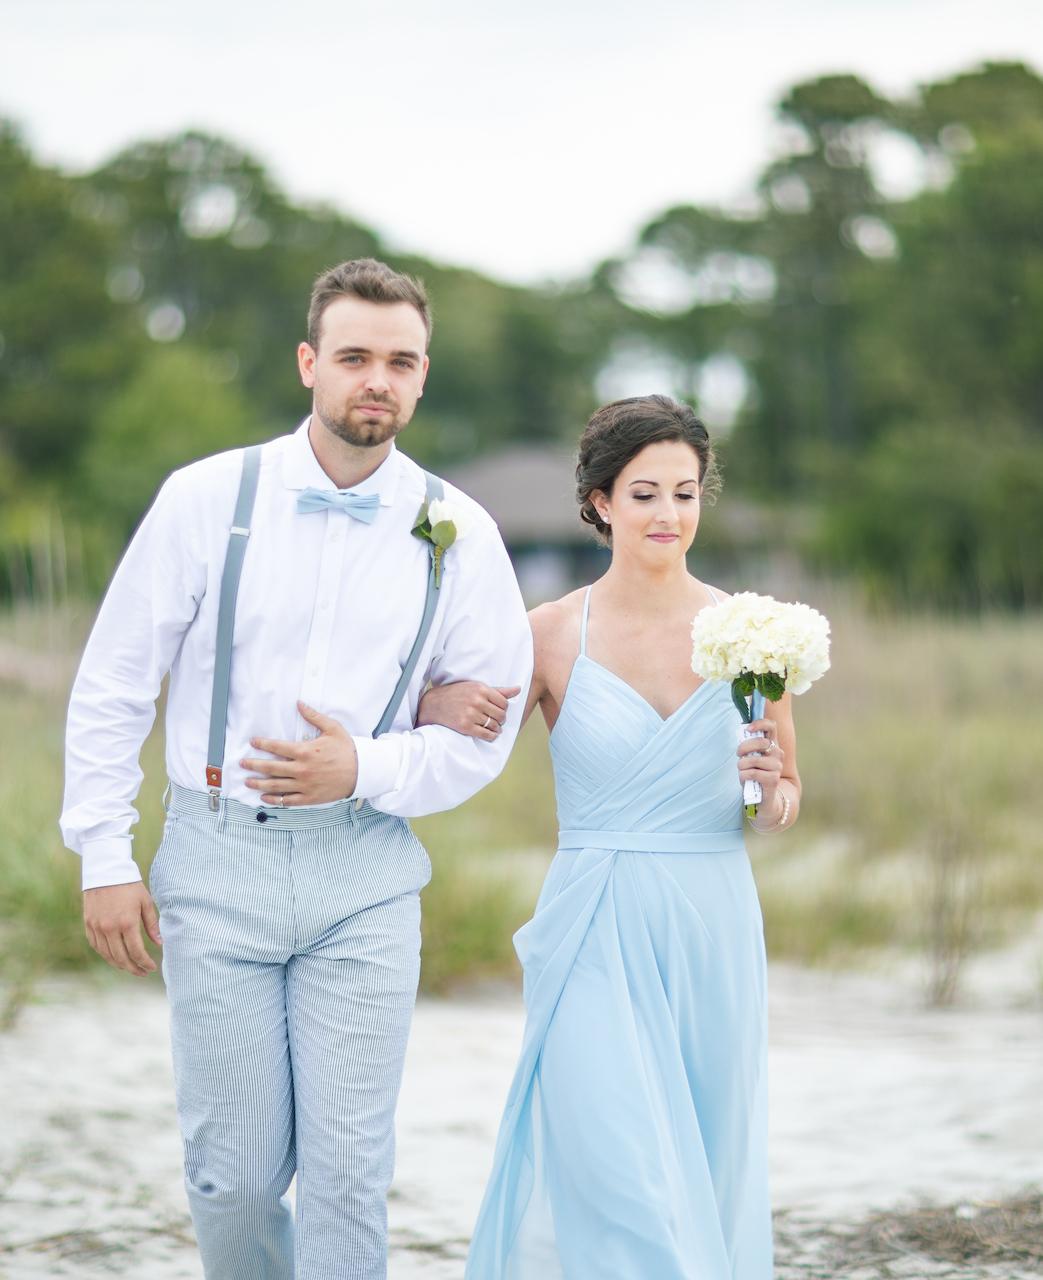 hilton-head-island-wedding-sc-ceremony16.jpg